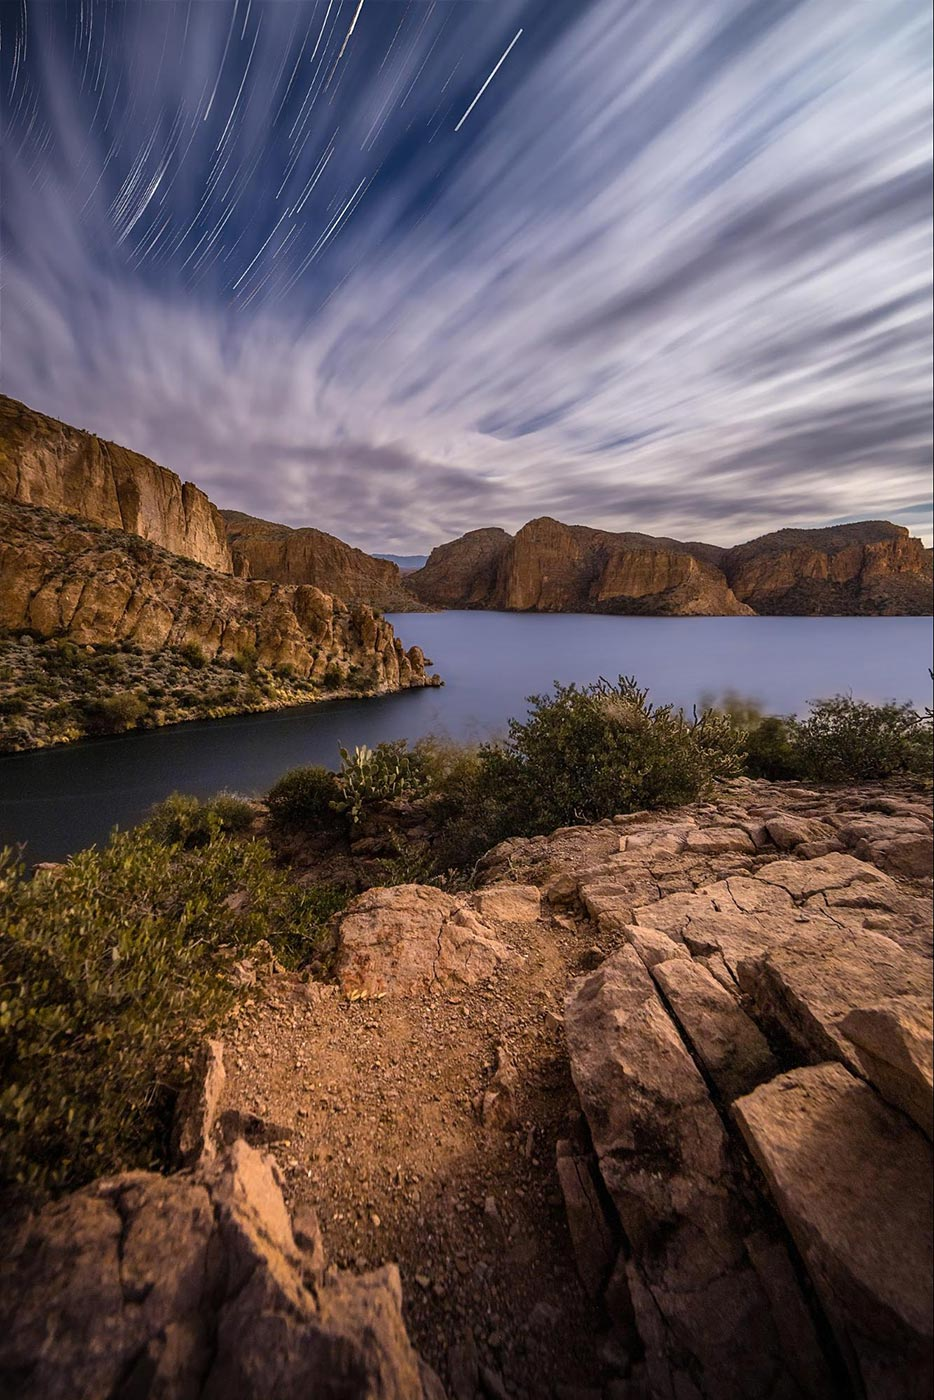 Moonlit Landscapes: A Tutorial | The Photon Collective